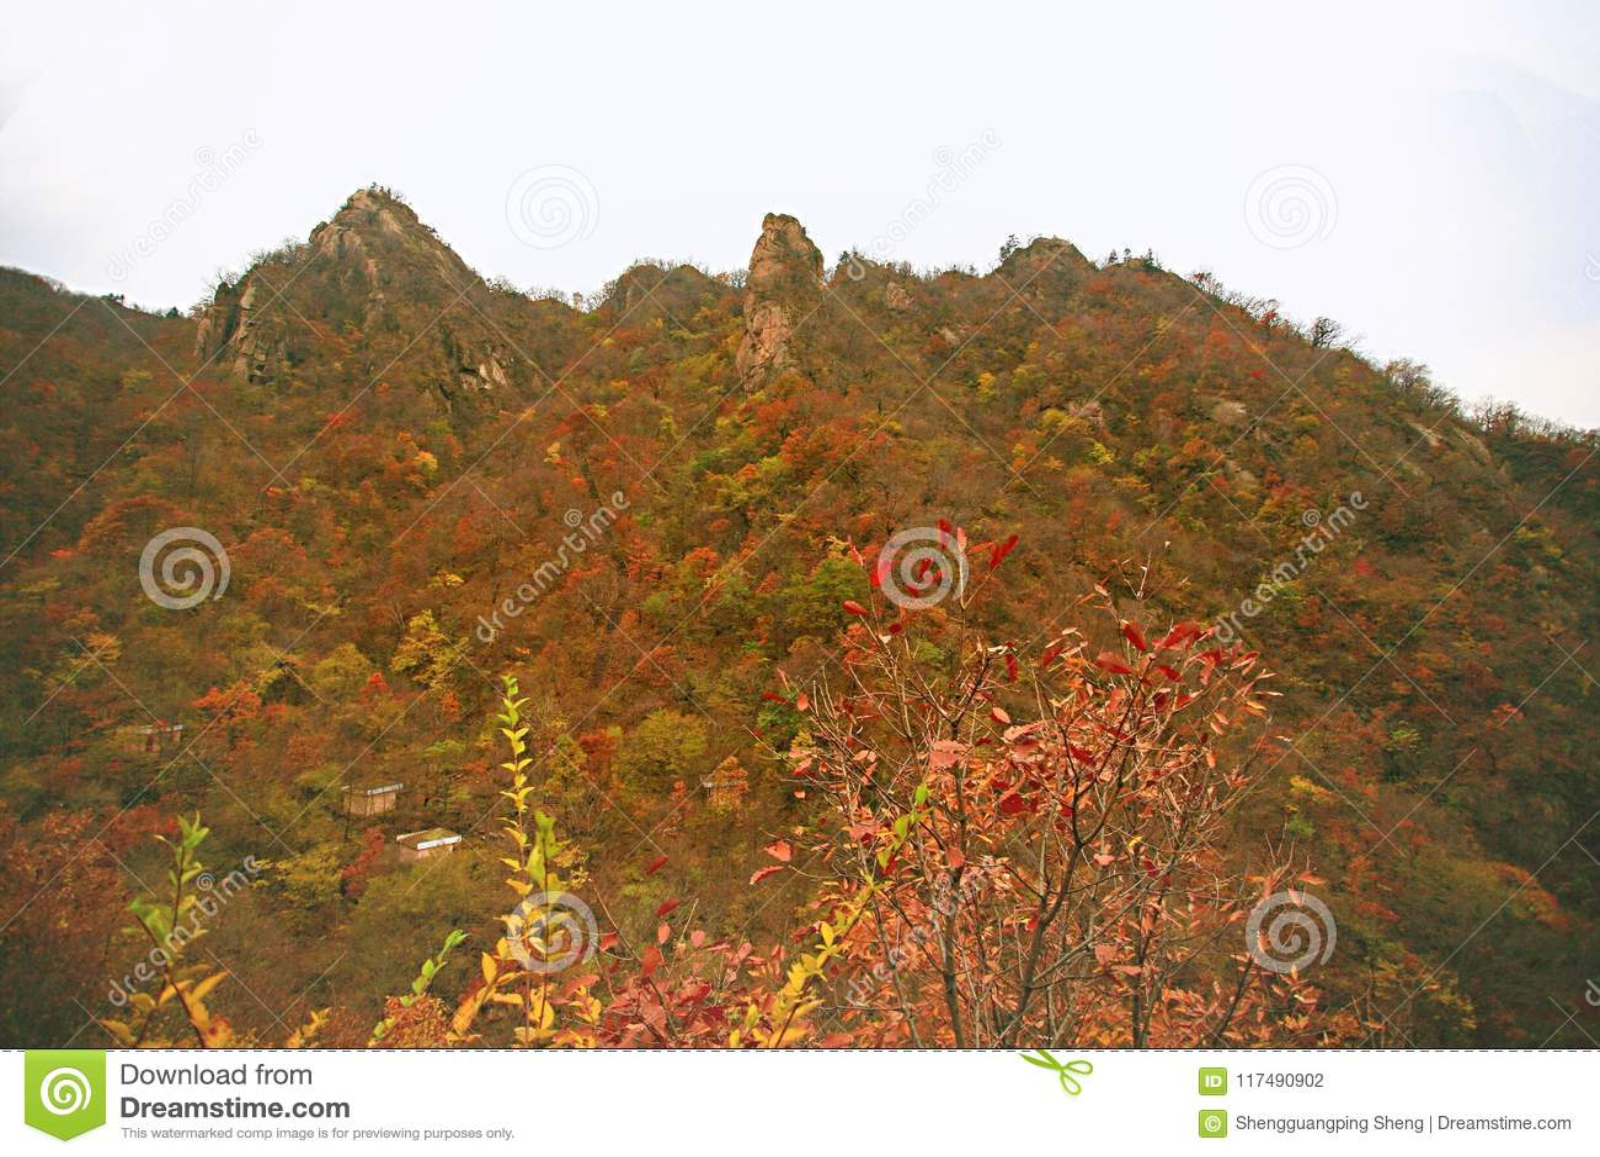 Taishan occidental, Ruyang